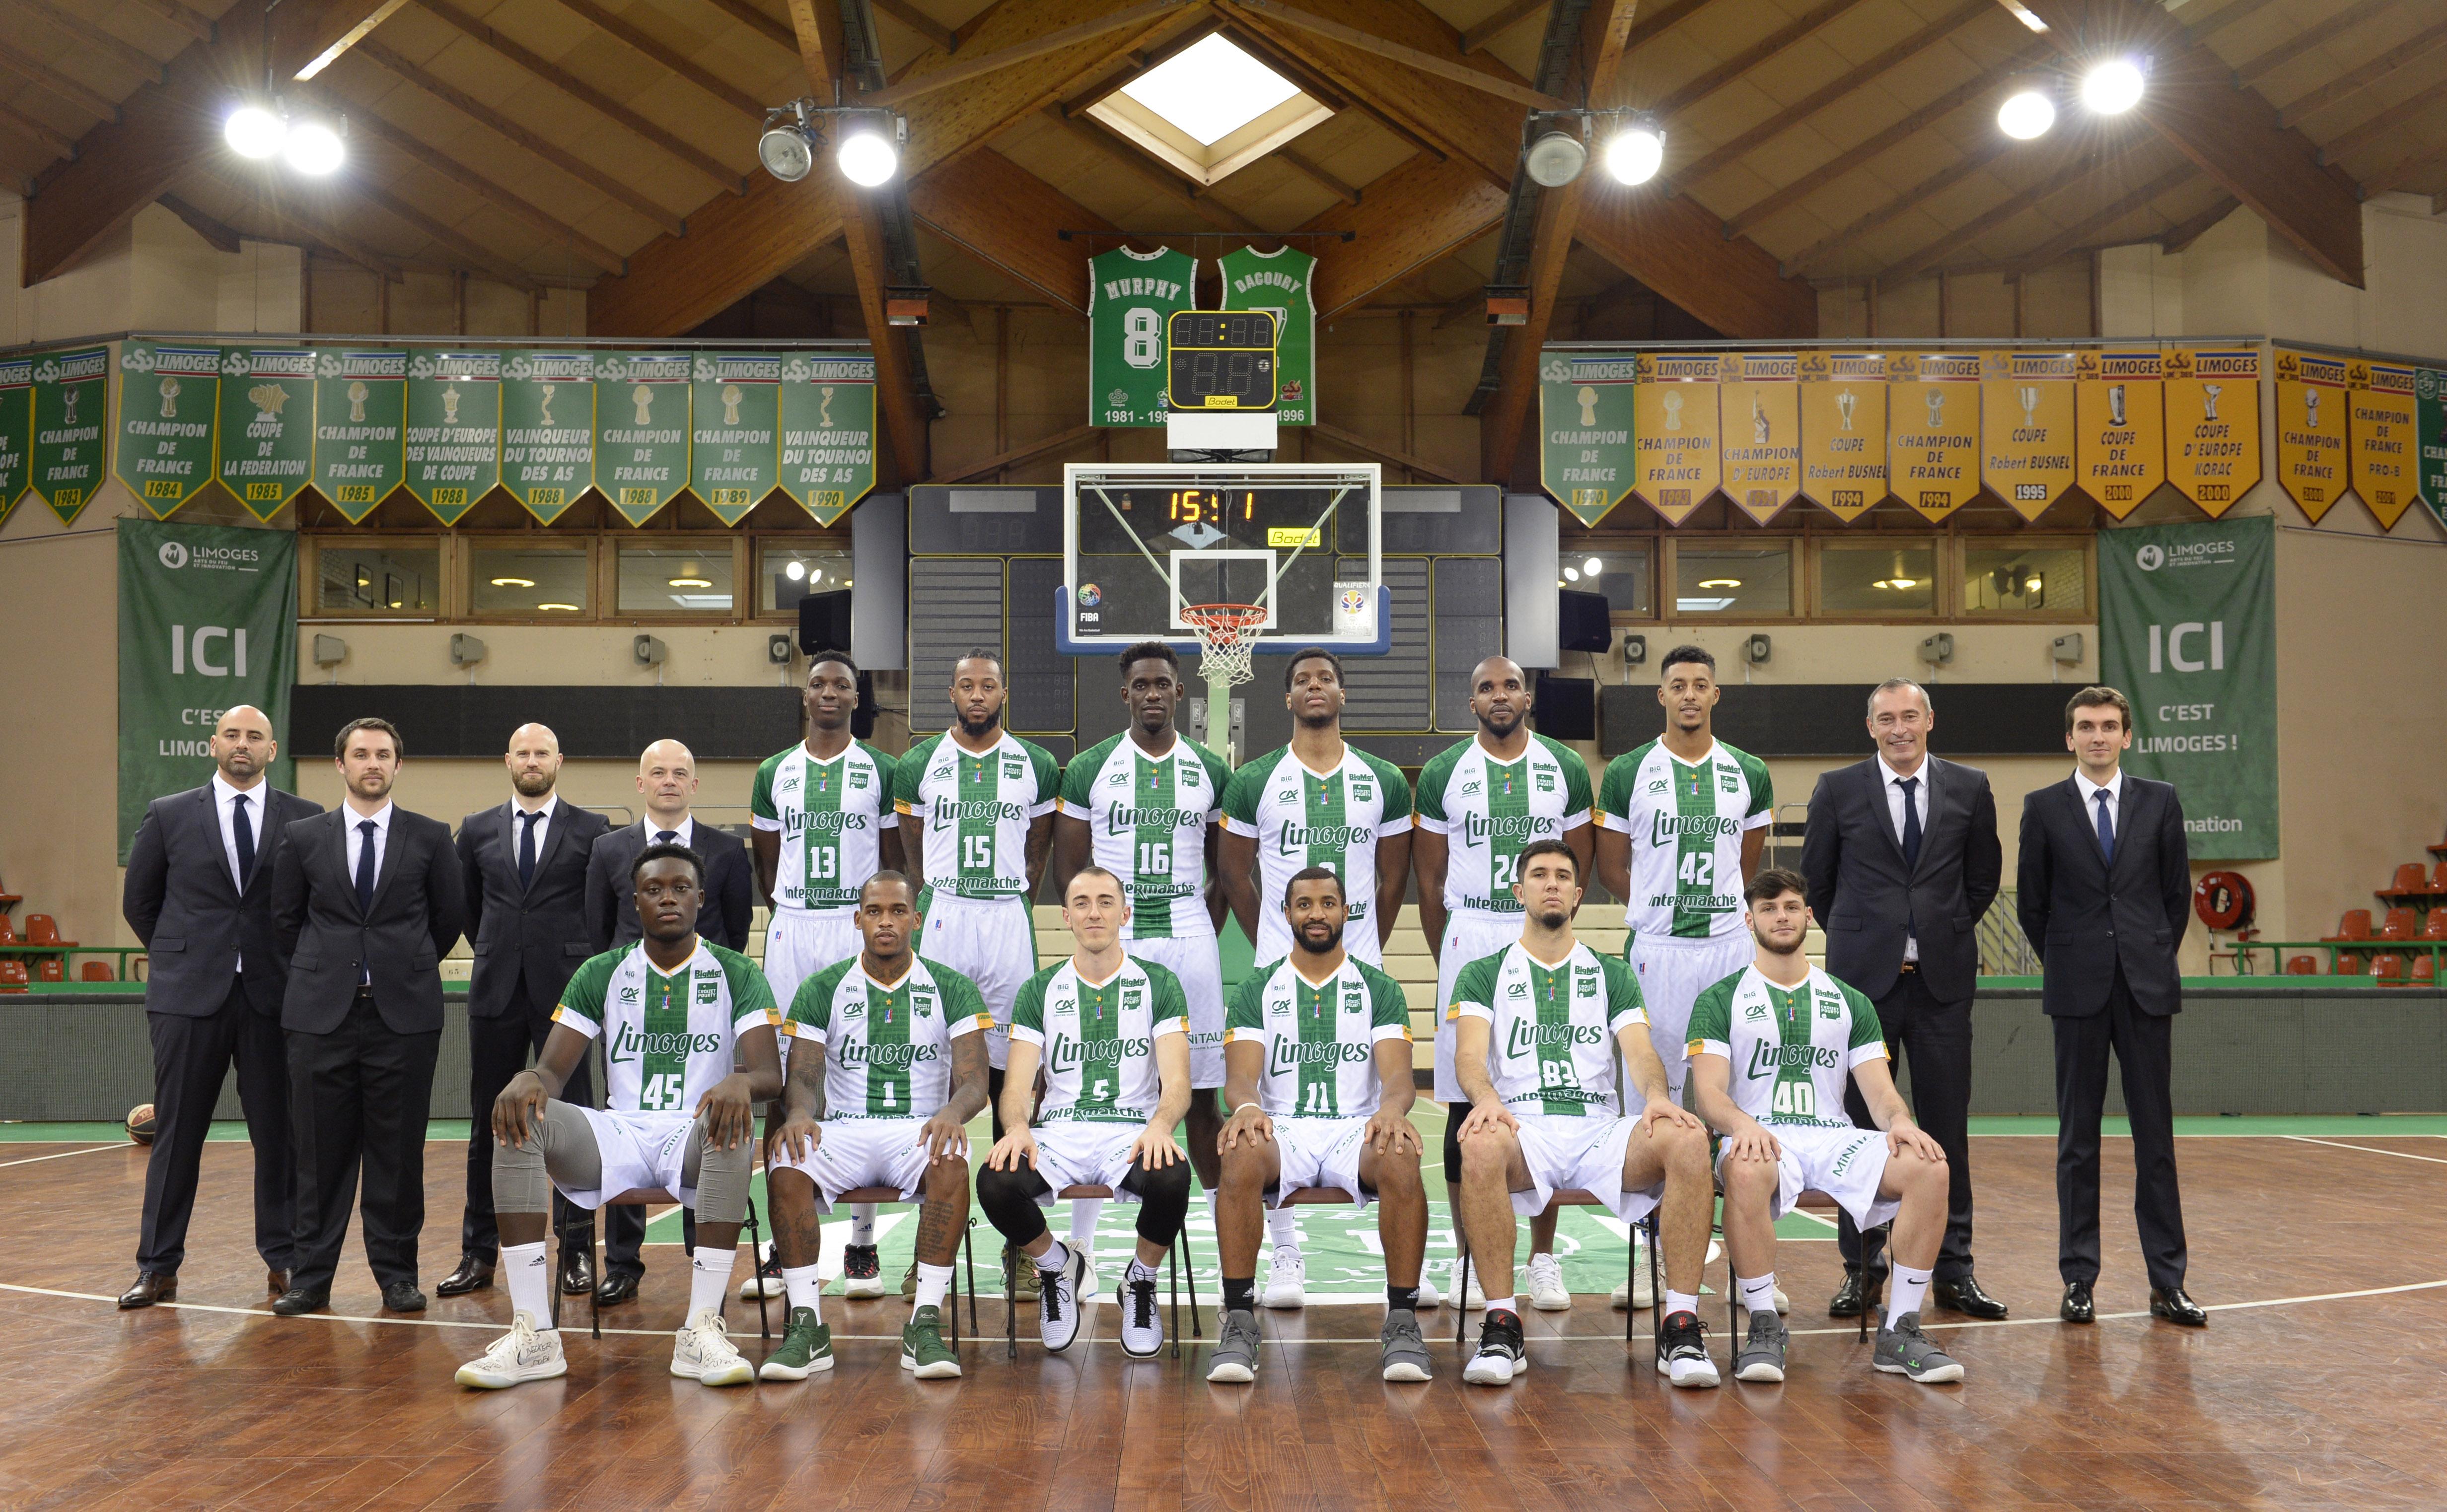 Photo équipe Limoges CSP 2018-2019